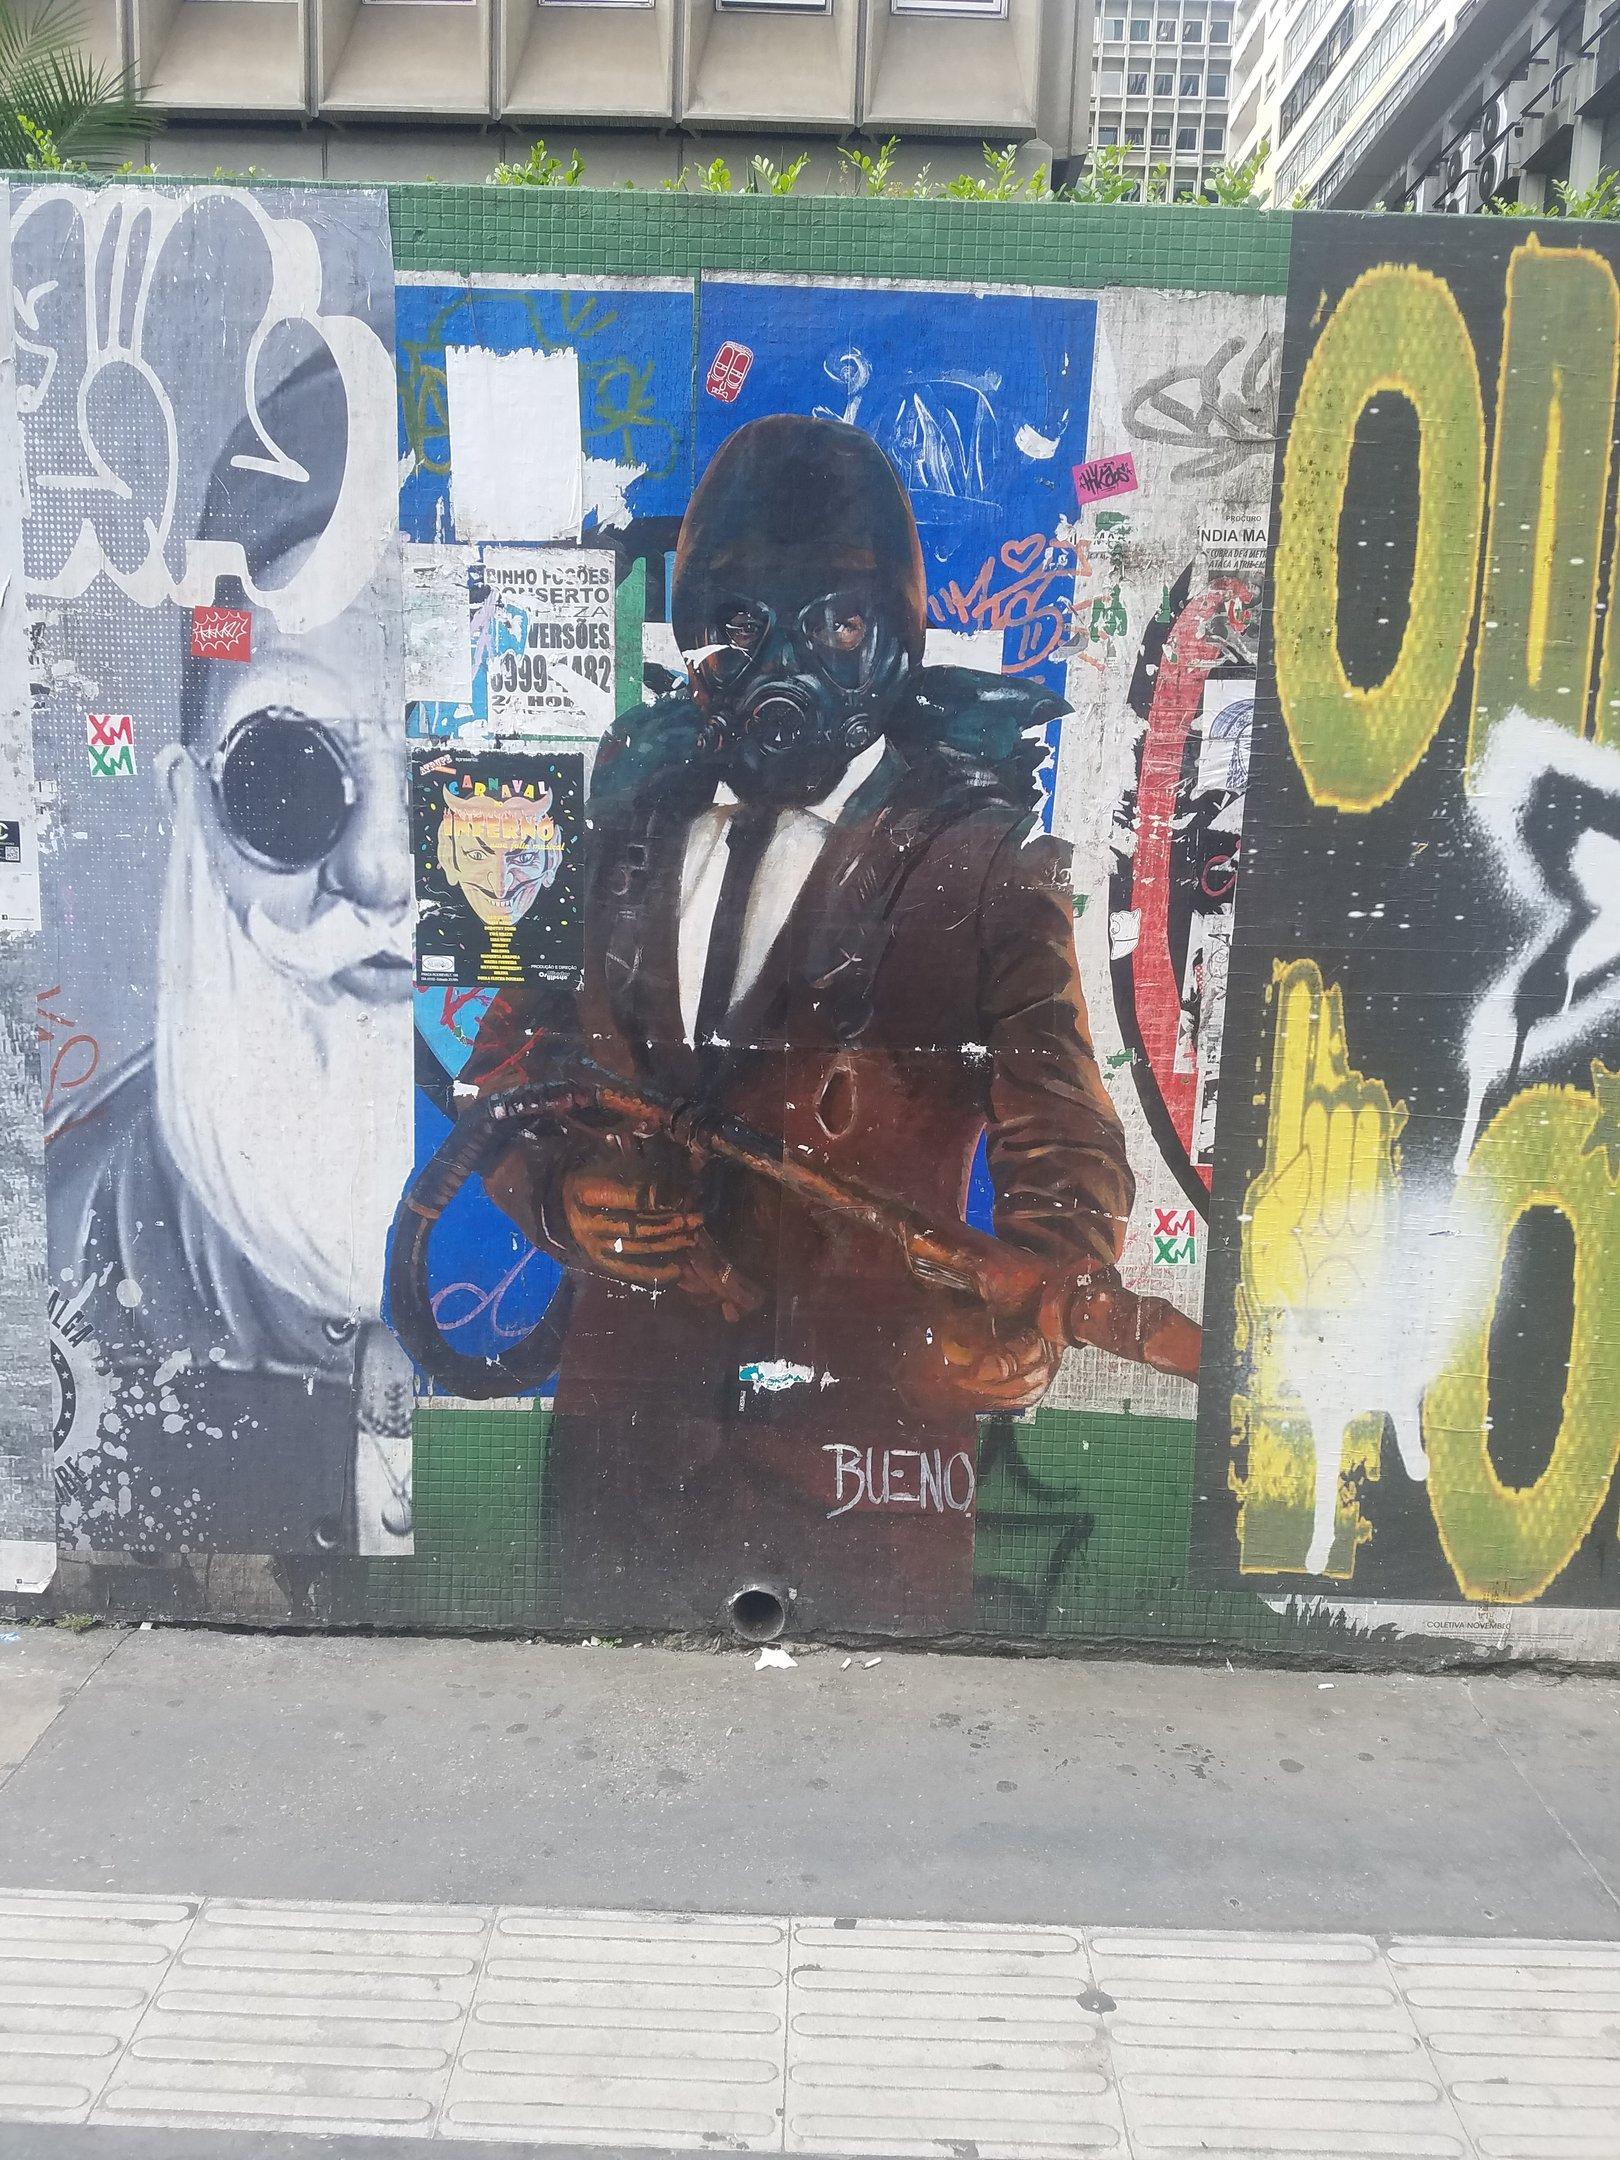 20190329_150225-jpg.49894_Public murals/street art/other images from São Paulo, Brazil_Art & Music_Squat the Planet_11:34 AM